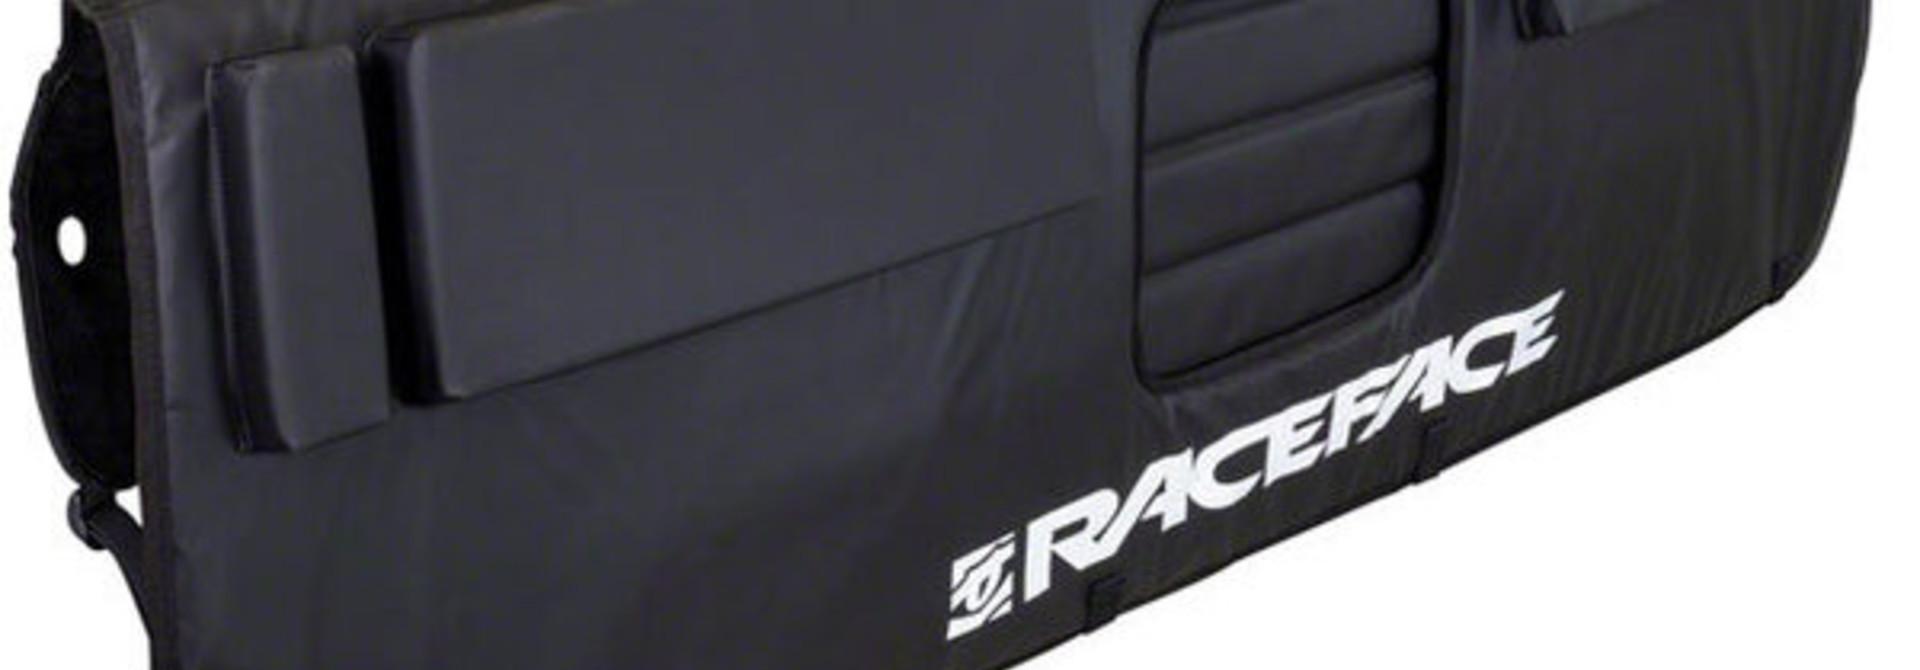 RaceFace T2 Tailgate Pad - Black Full